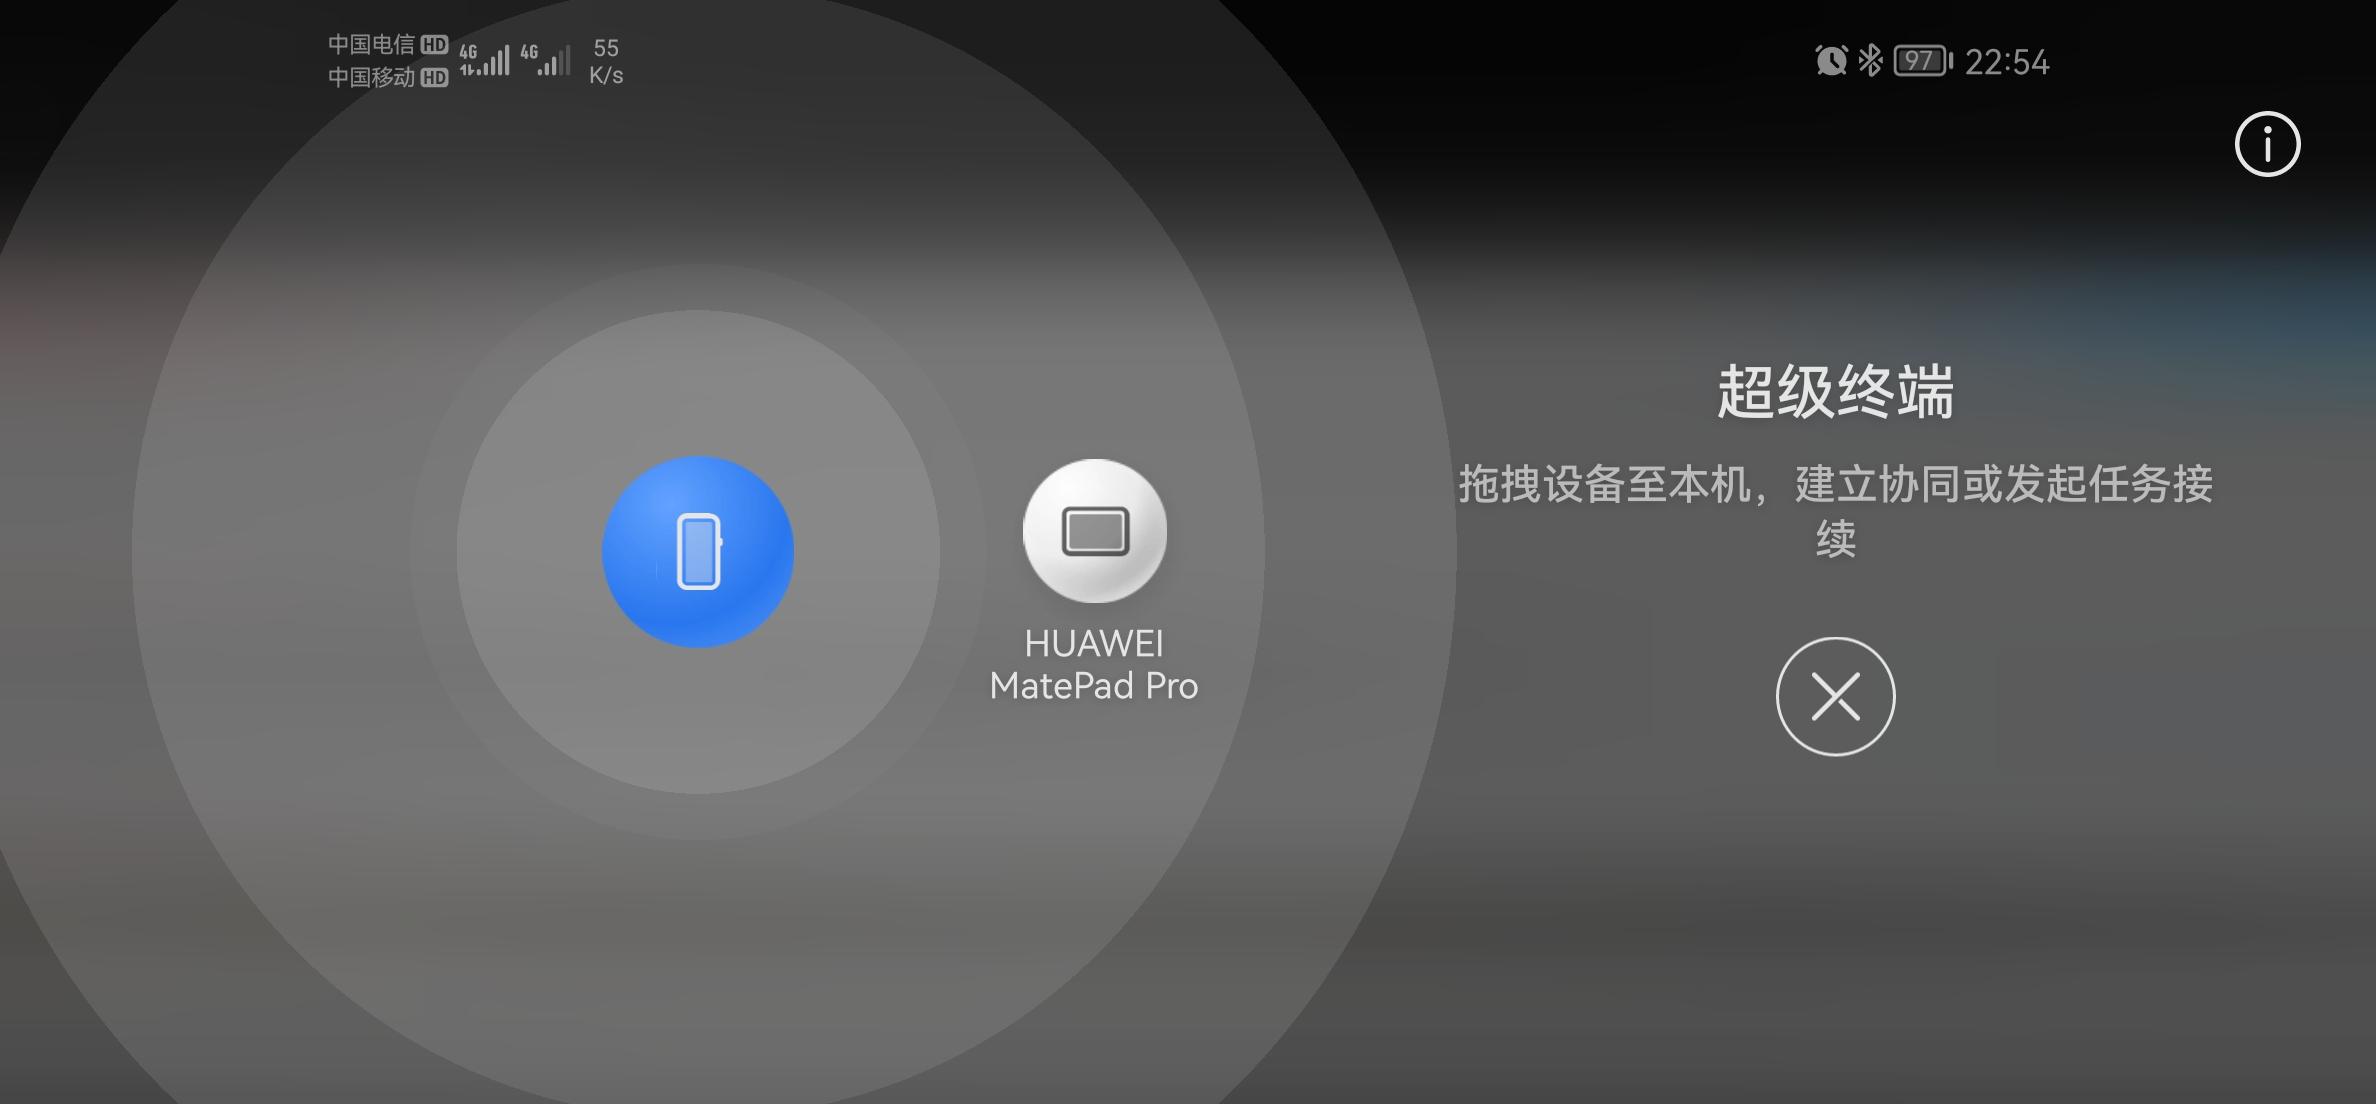 Screenshot_20210622_225426_com.huawei.controlcenter.jpg